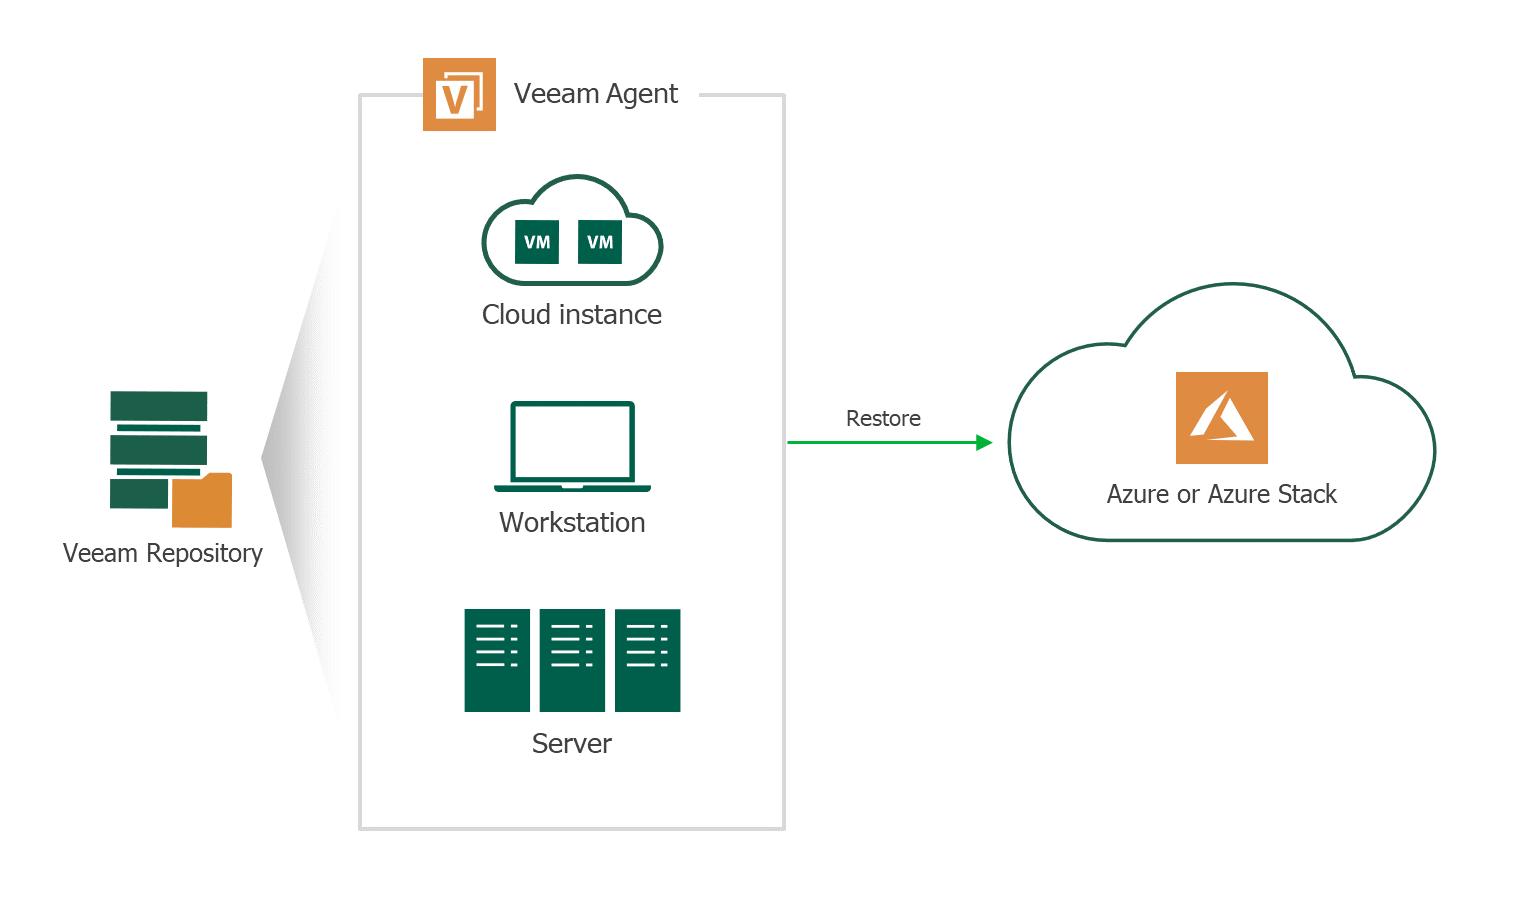 Windows Server Backup Software - Veeam